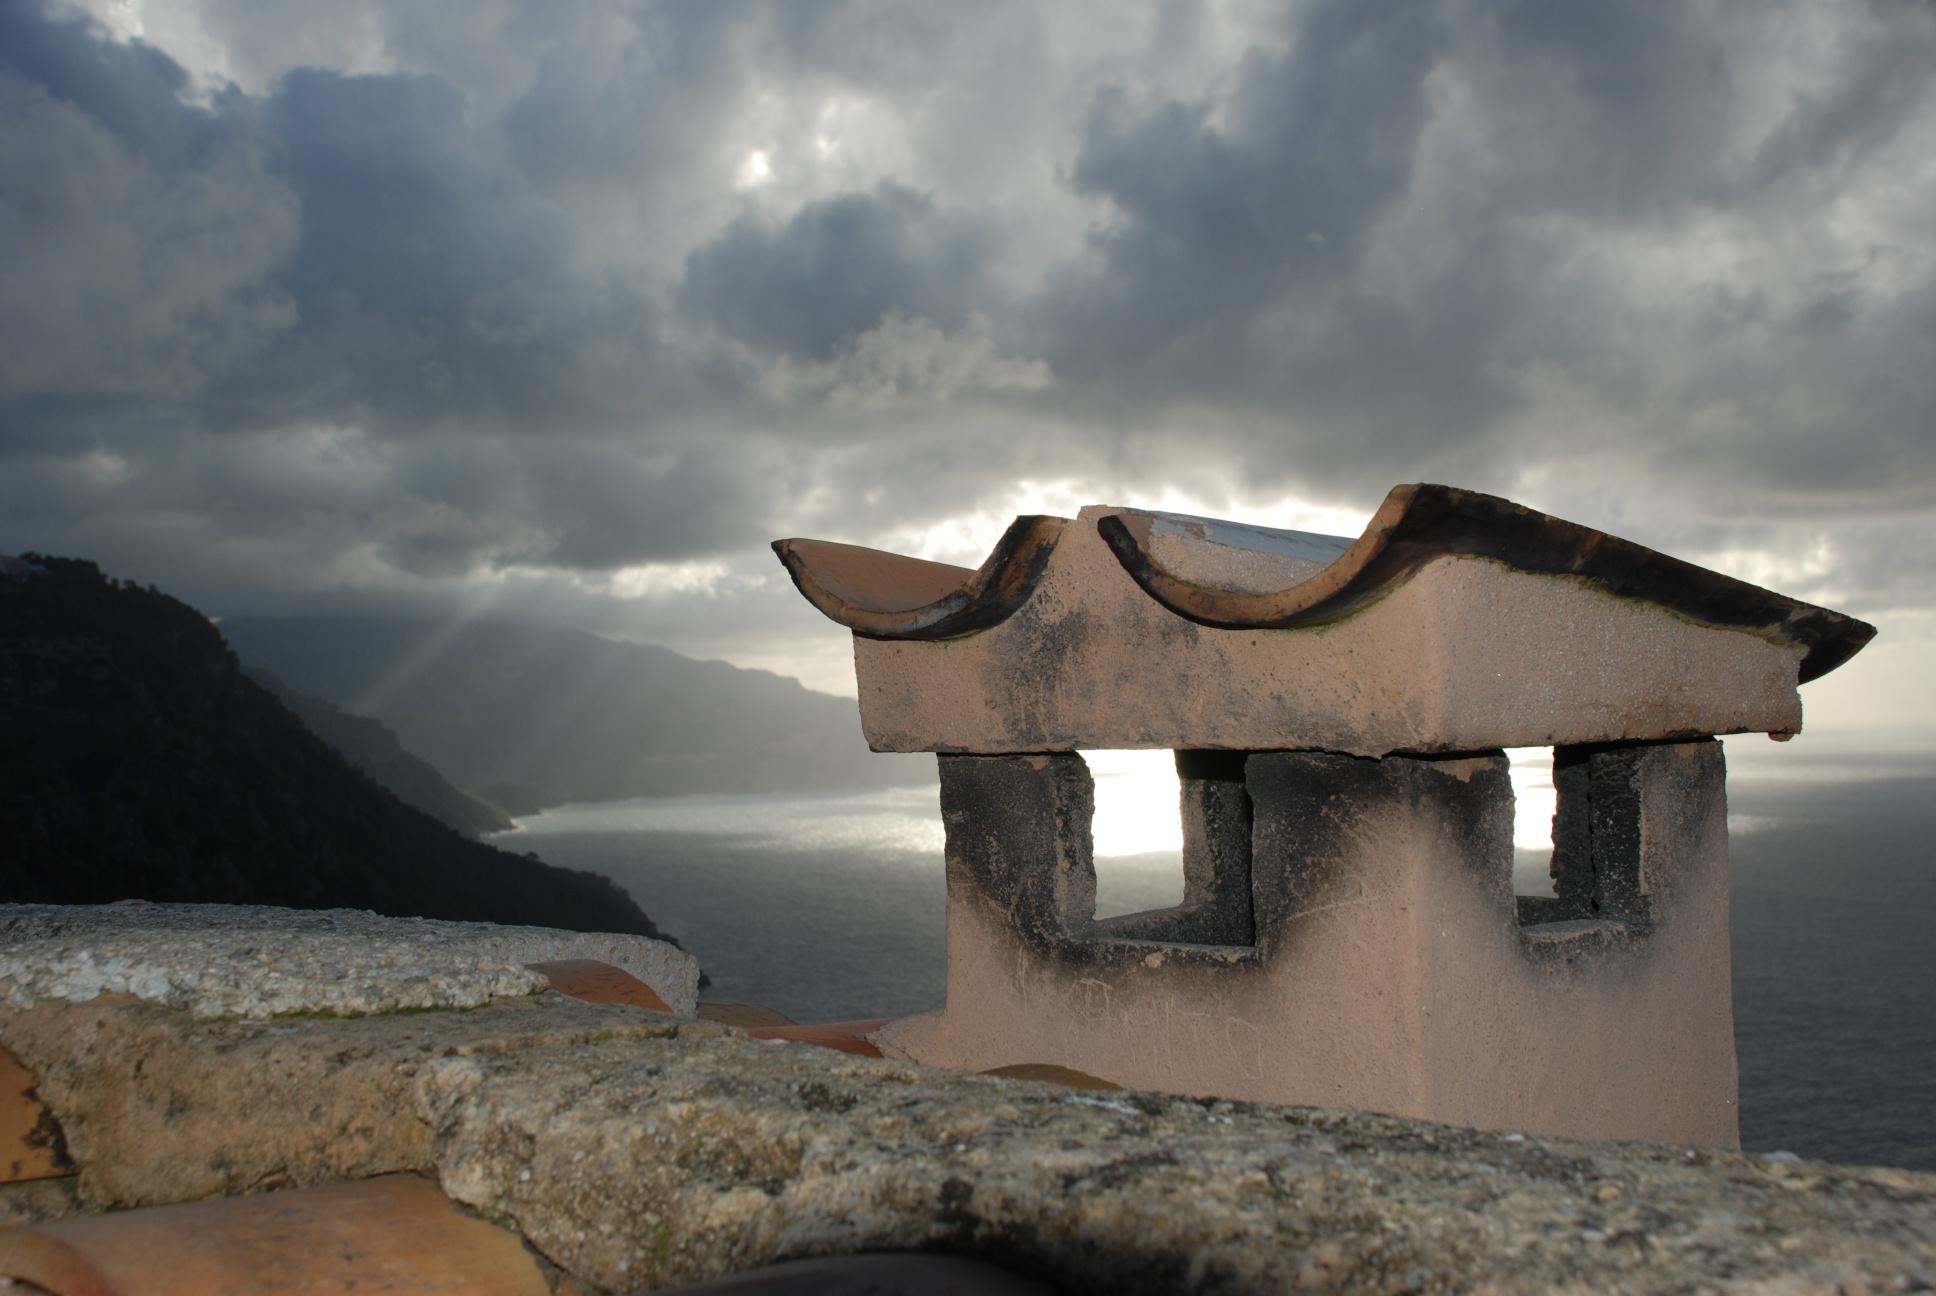 Über den Dächern Mallorcas